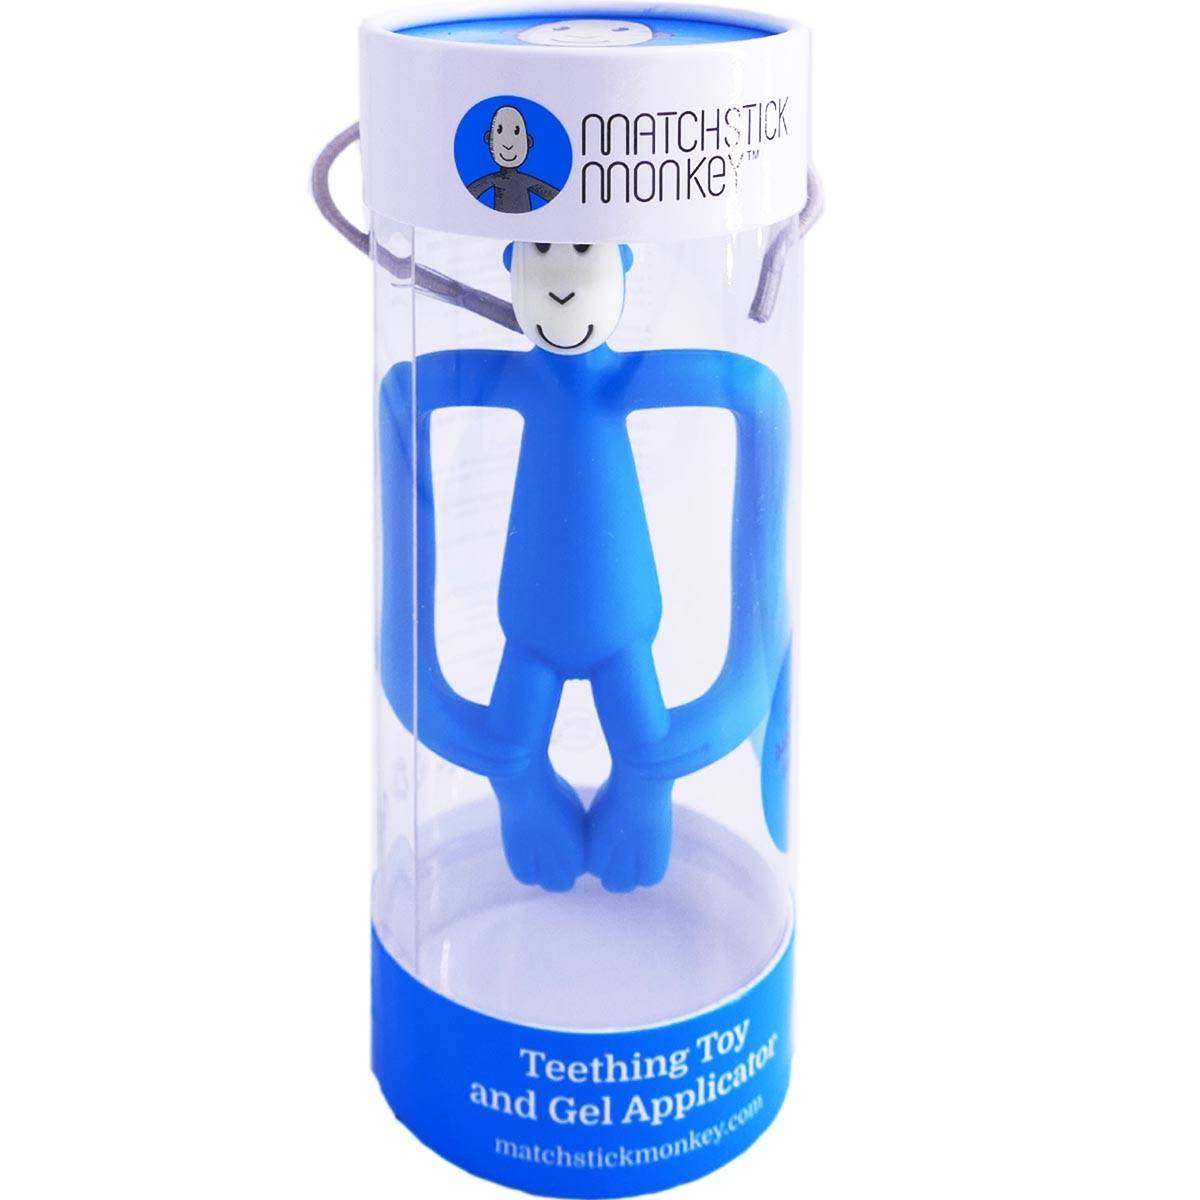 DIVERS Matchstick monkey anneau dentition singe bleu